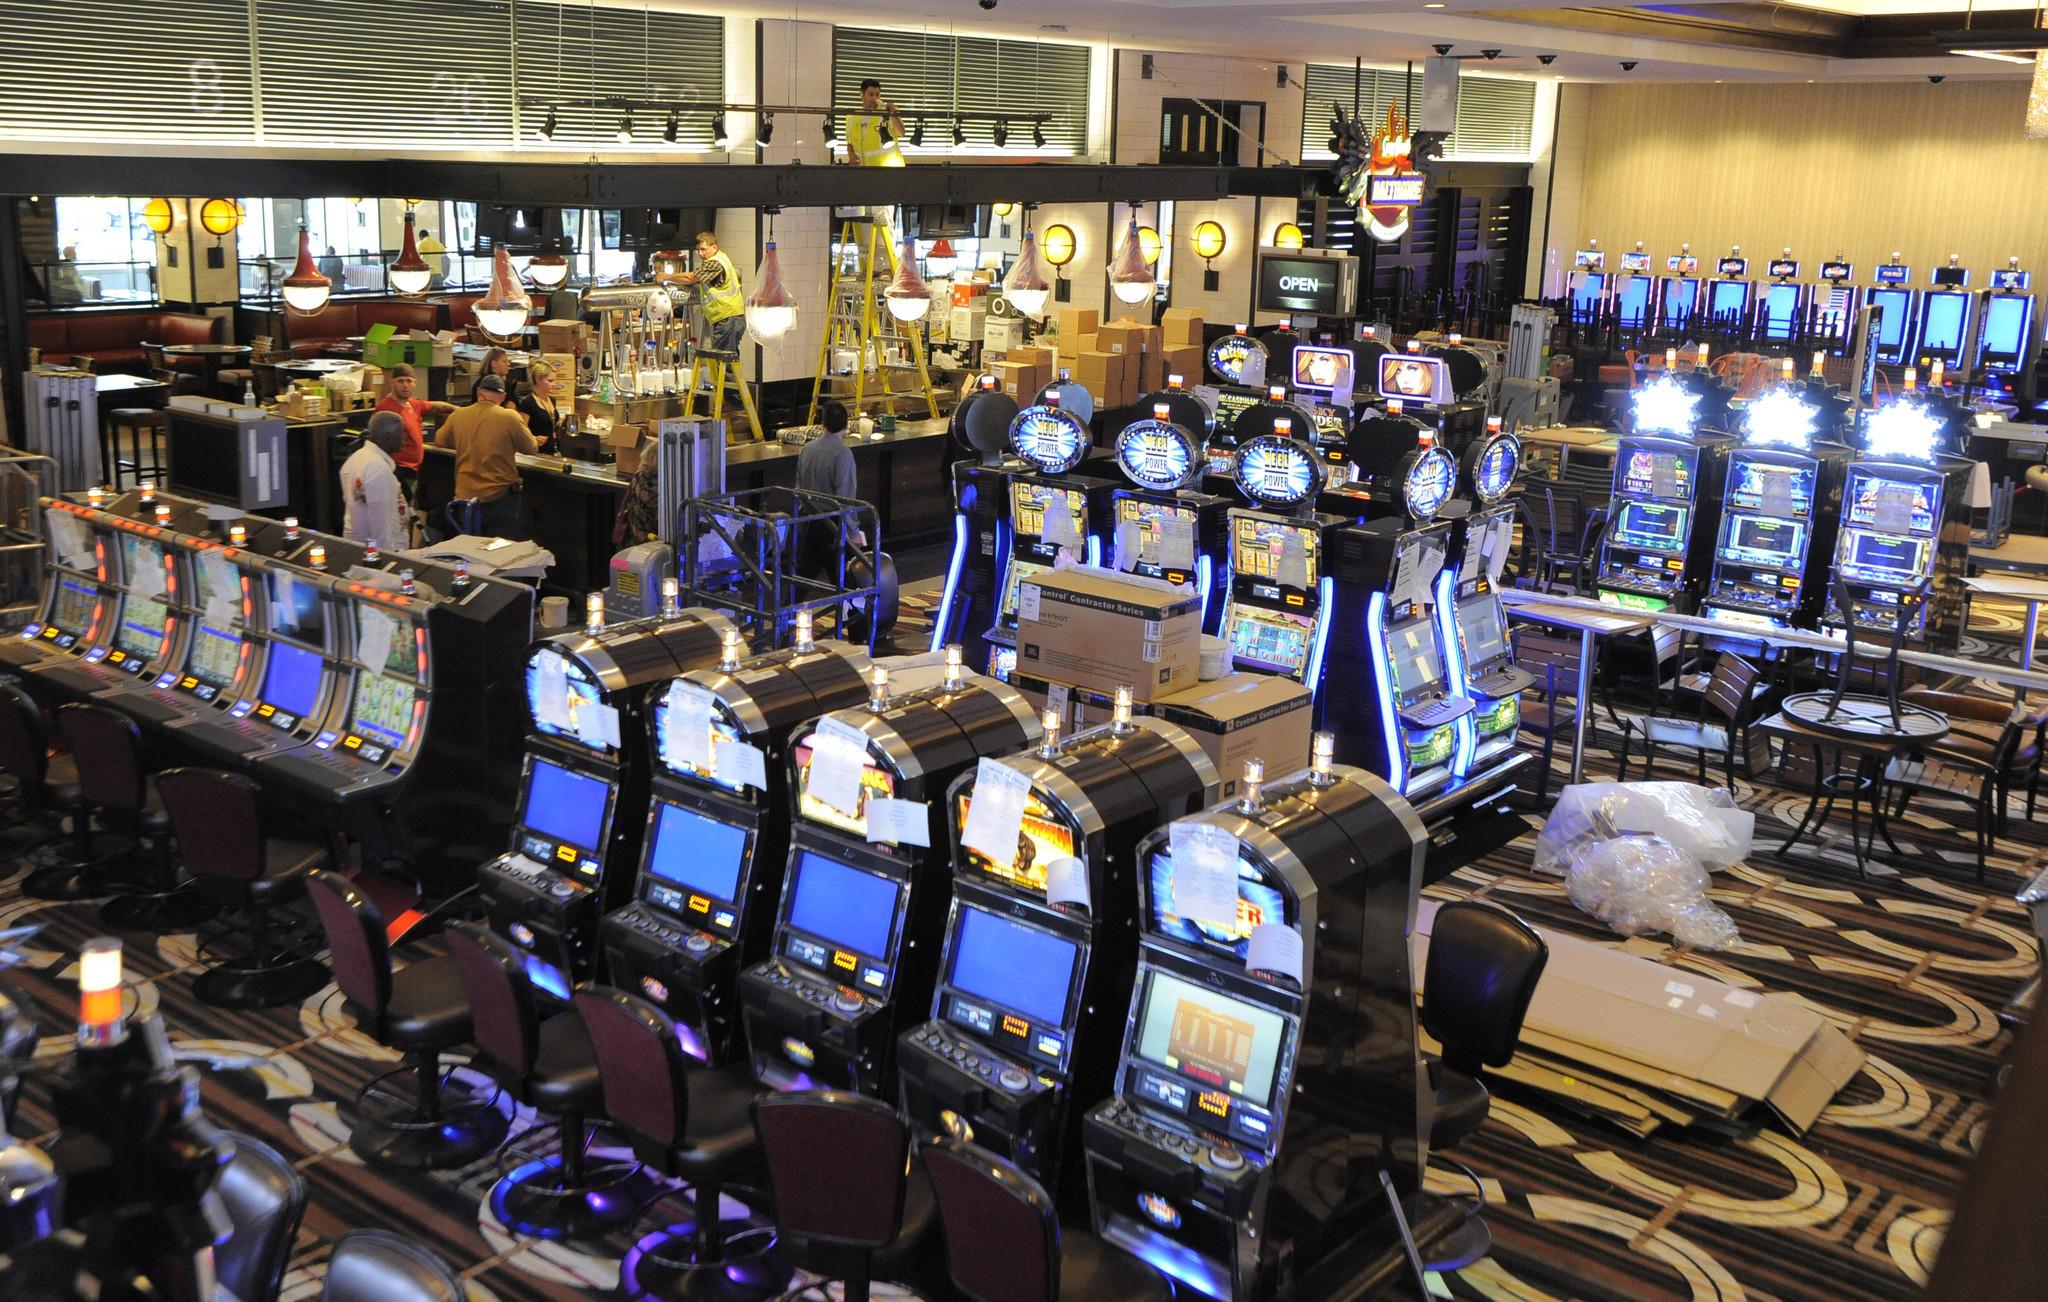 Horseshoe casino maryland job fair